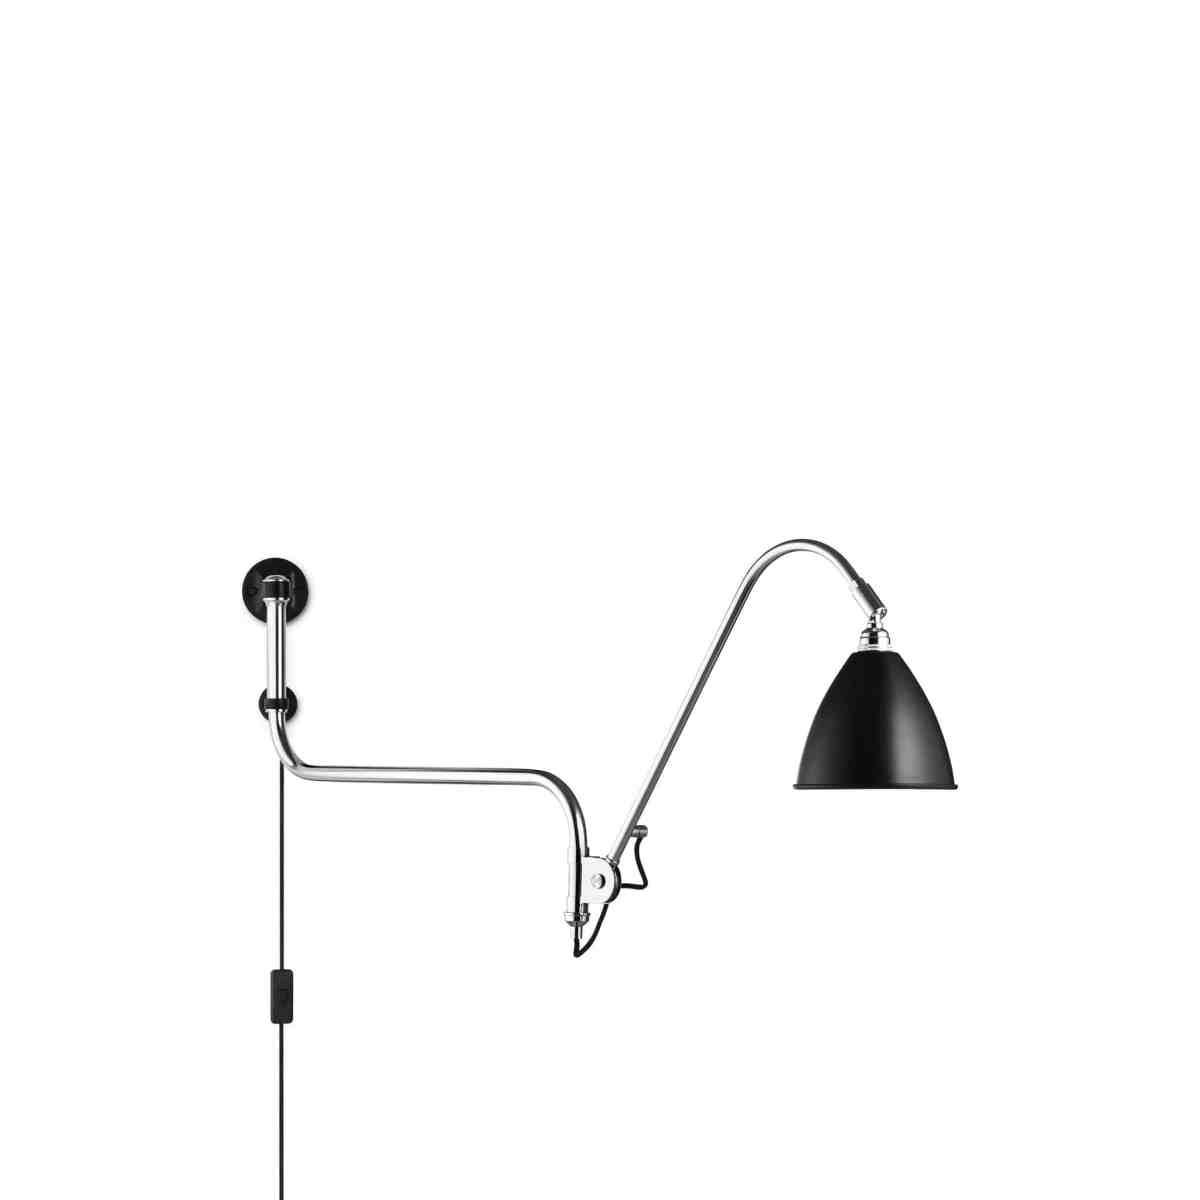 gubi-bestlite-wall-lamp-black-002